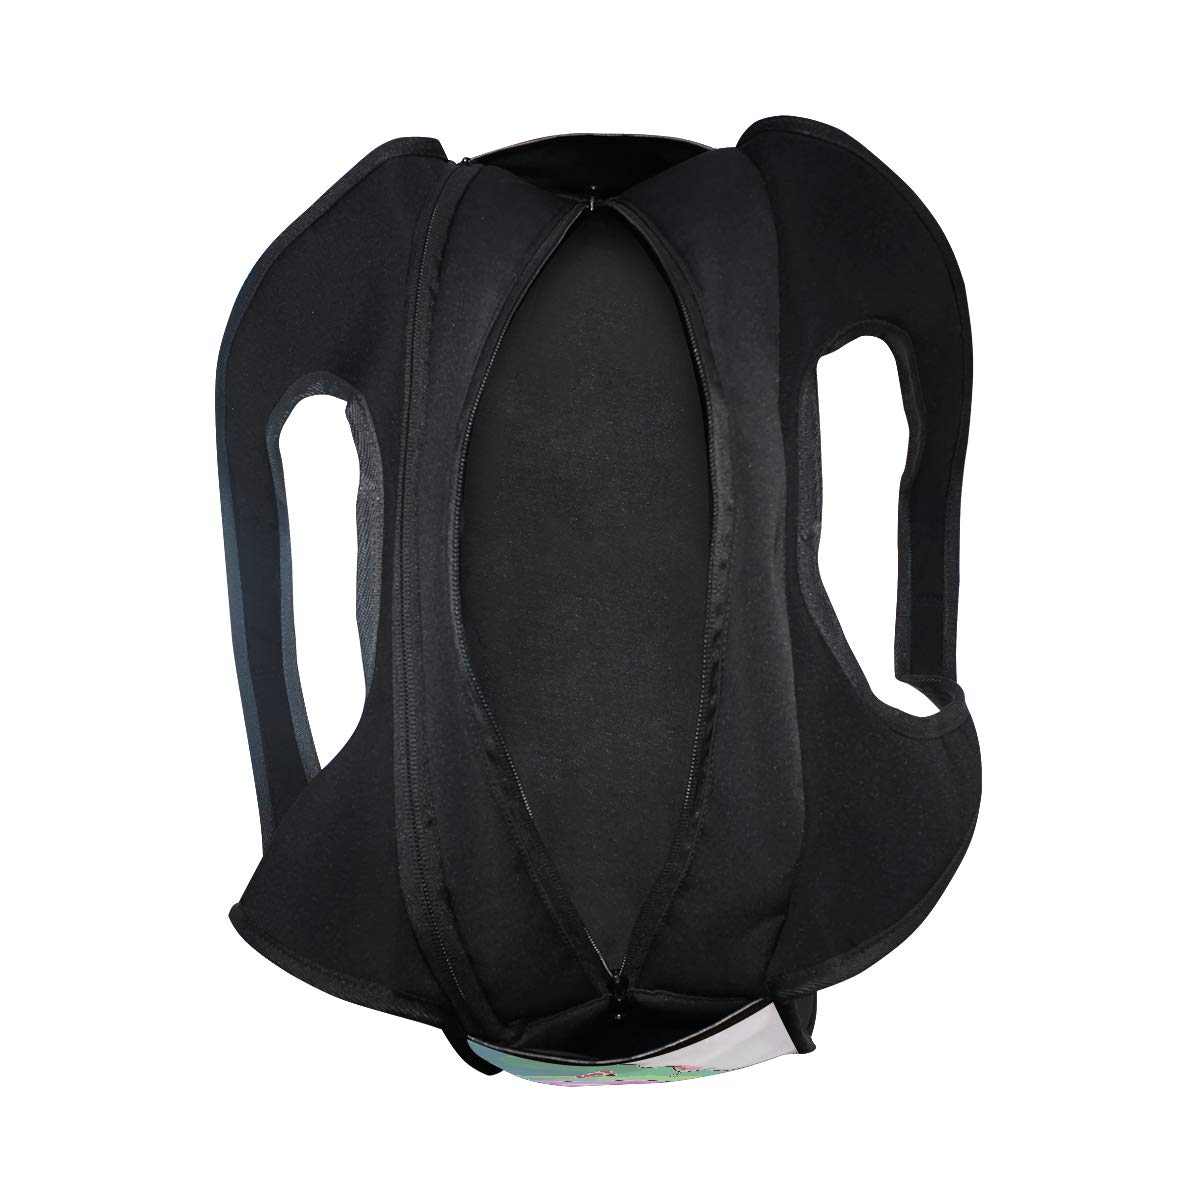 Fantasy Purple Bubble Women Sports Gym Totes Bag Multi-Function Nylon Travel Shoulder Bag